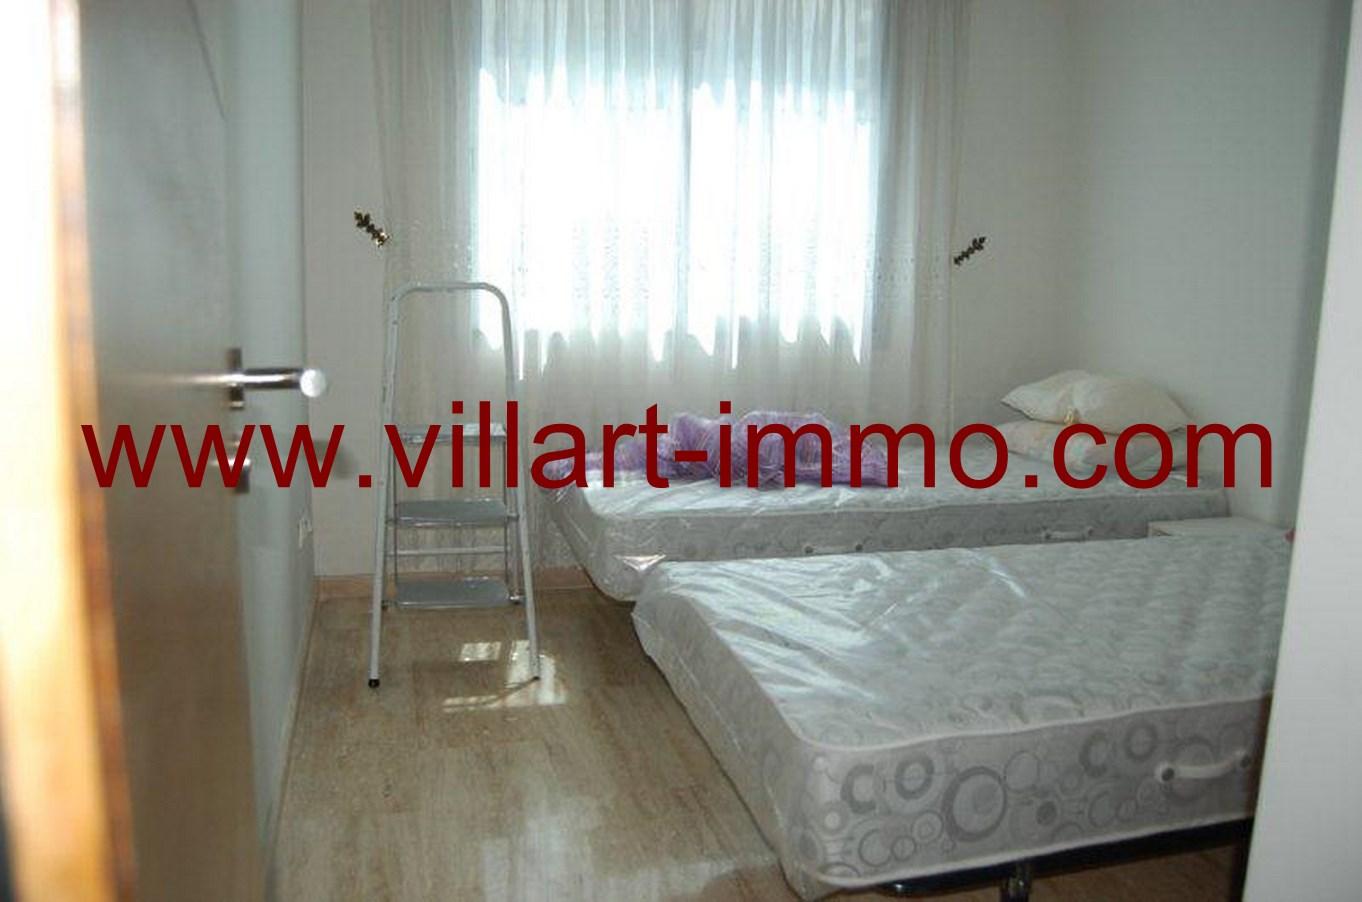 6-Location-Appartement-meublé-Tanger-chambre 2 -L678-Villart-immo